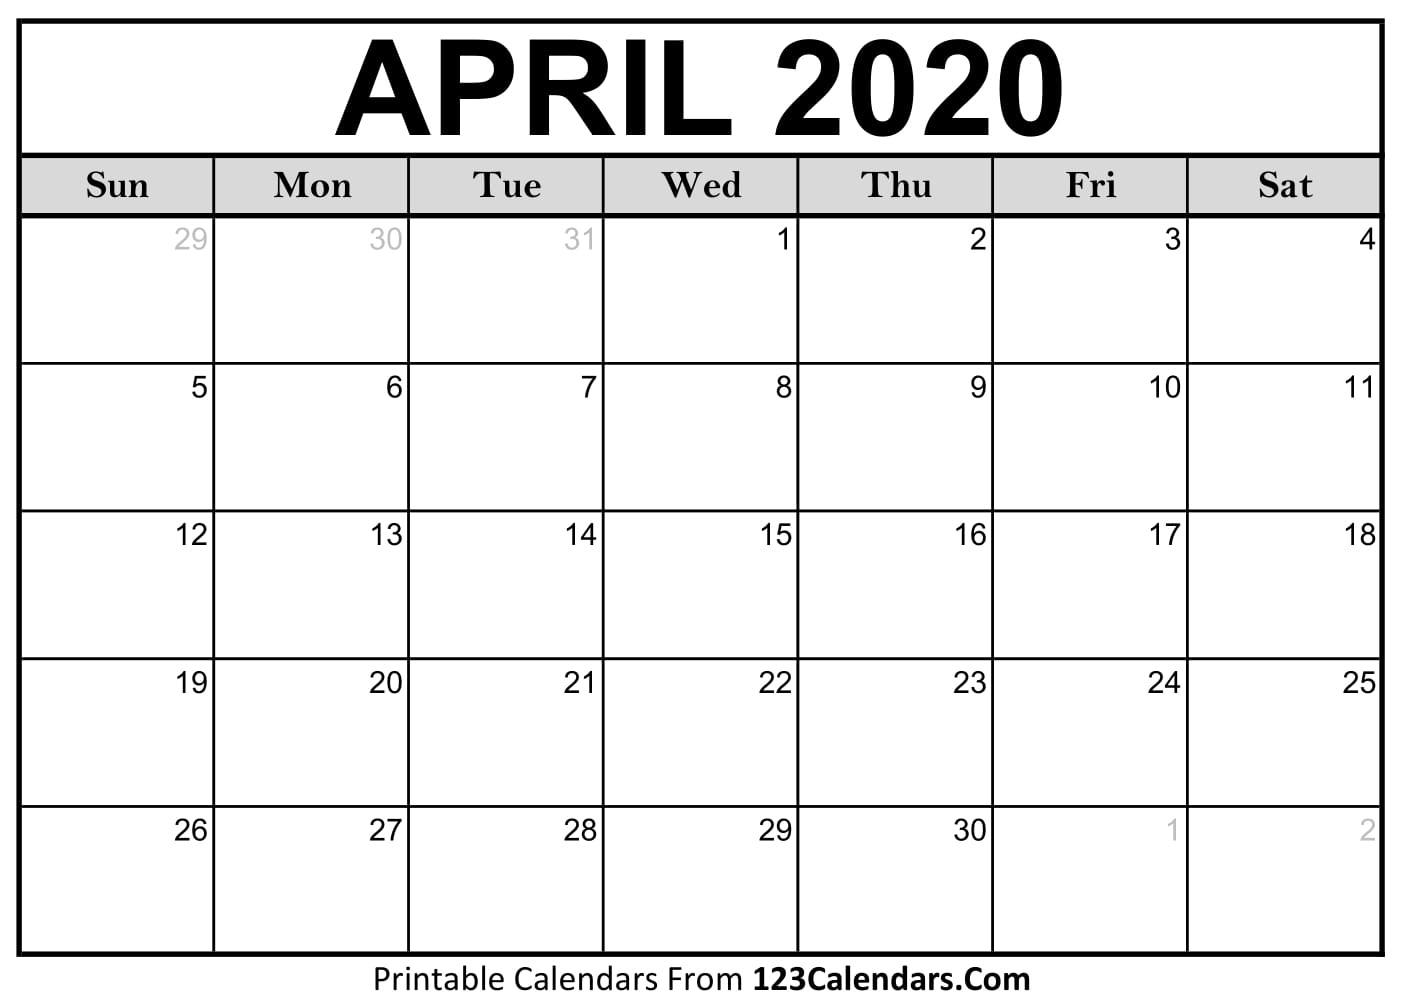 2020 Printable Calendar April | Printable Calendar Free Waterproof Calendar August 2021